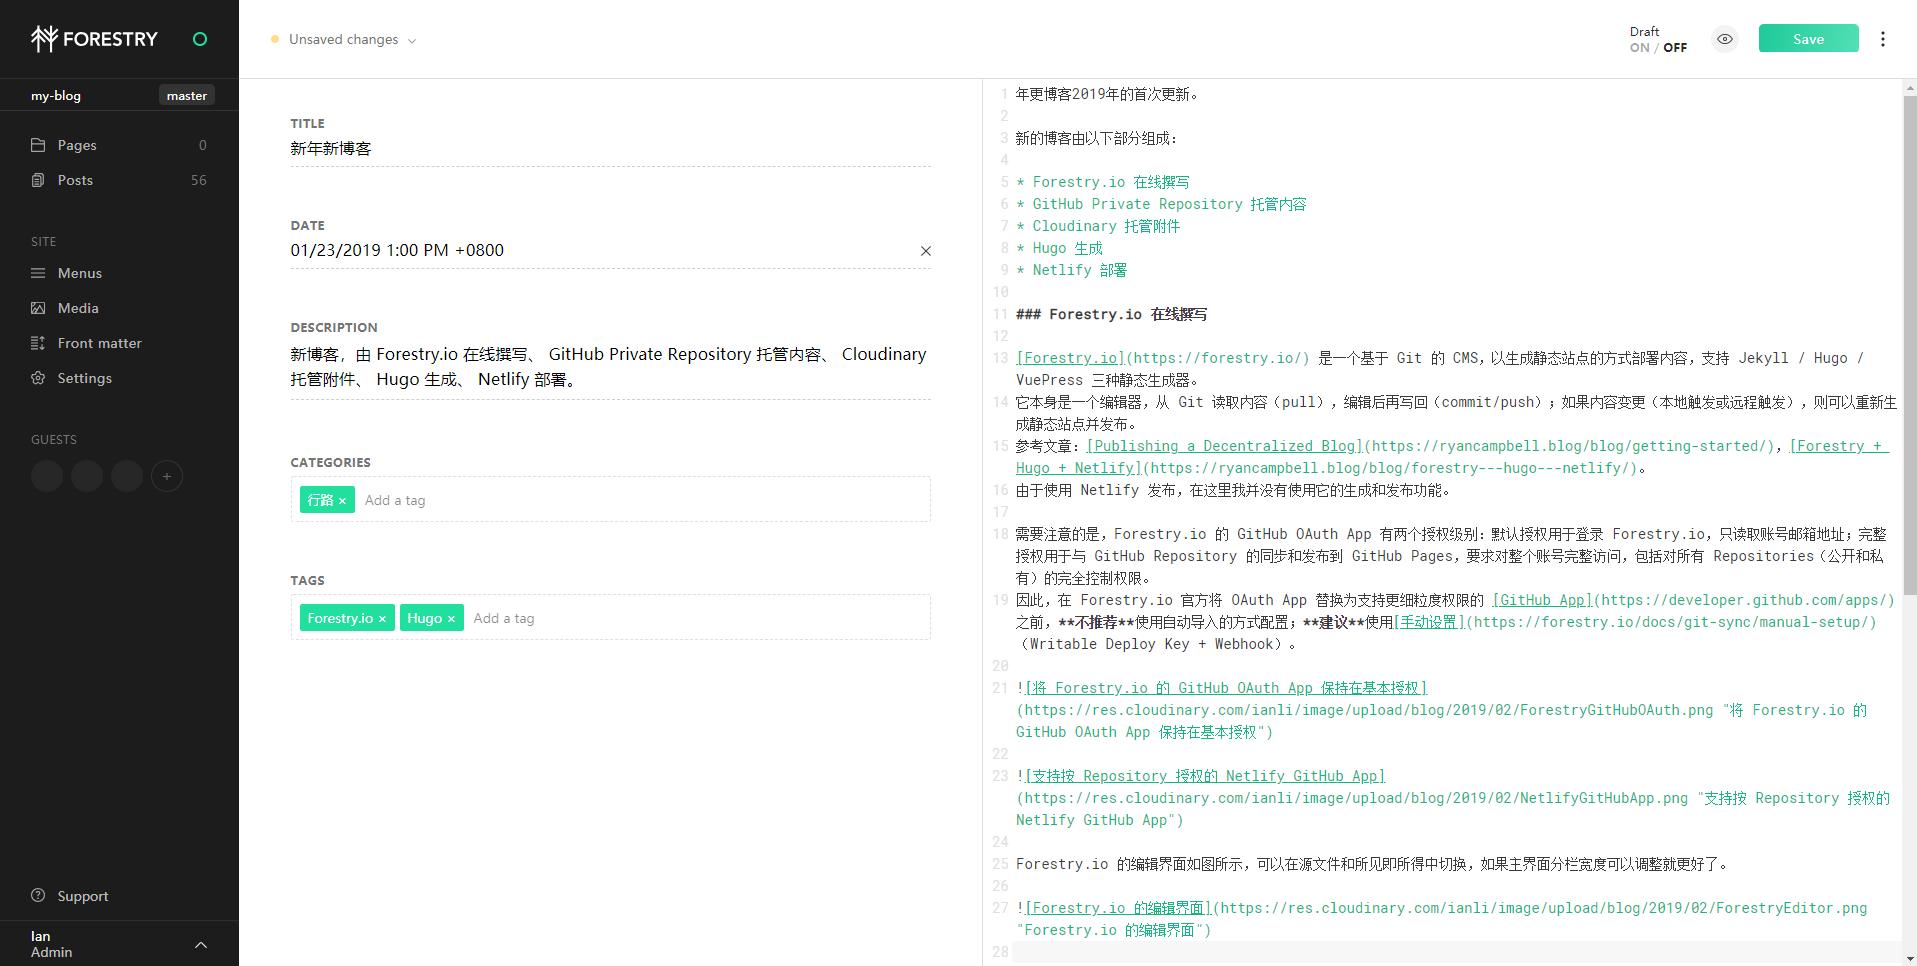 Forestry.io 的编辑界面